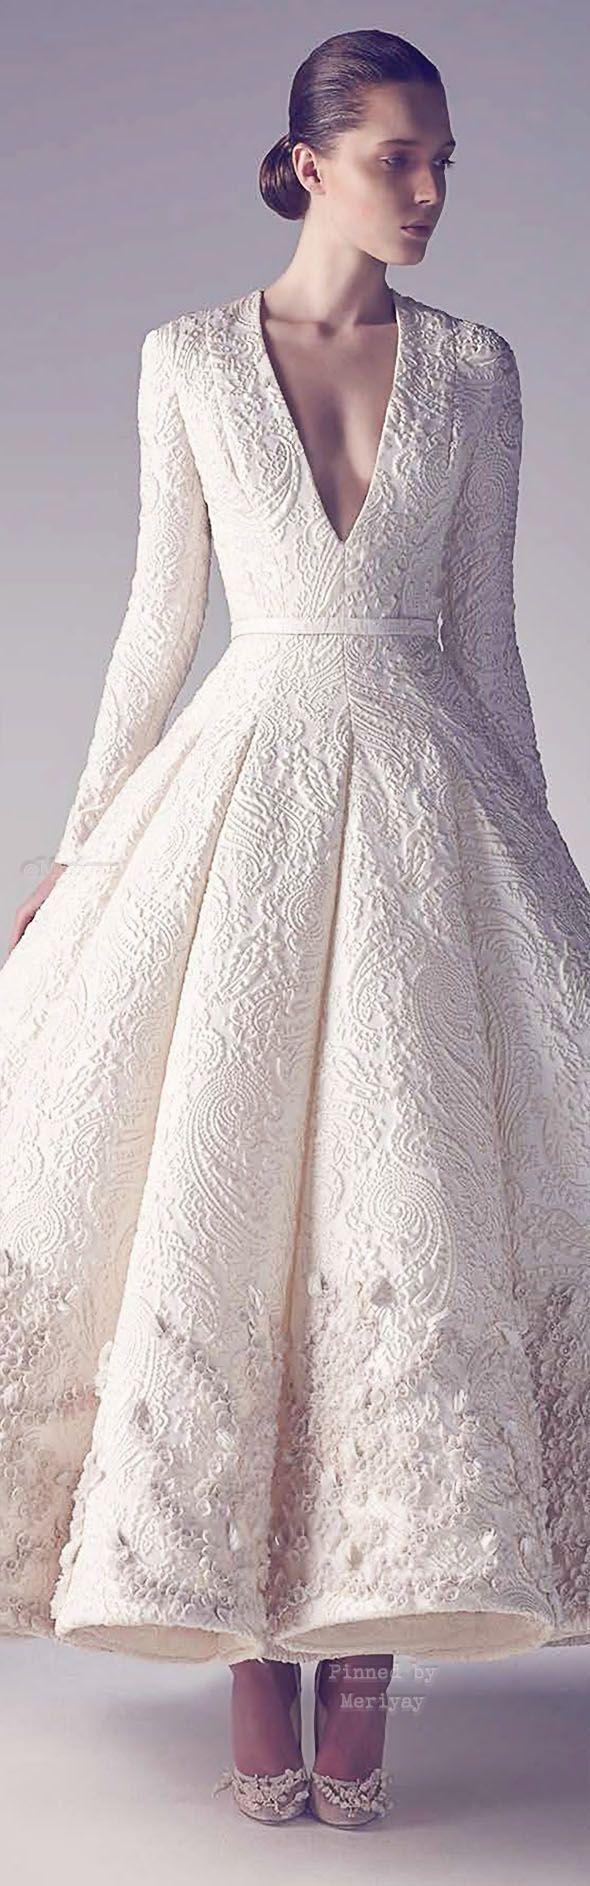 Lace satin long evening dress pinterestsopphega